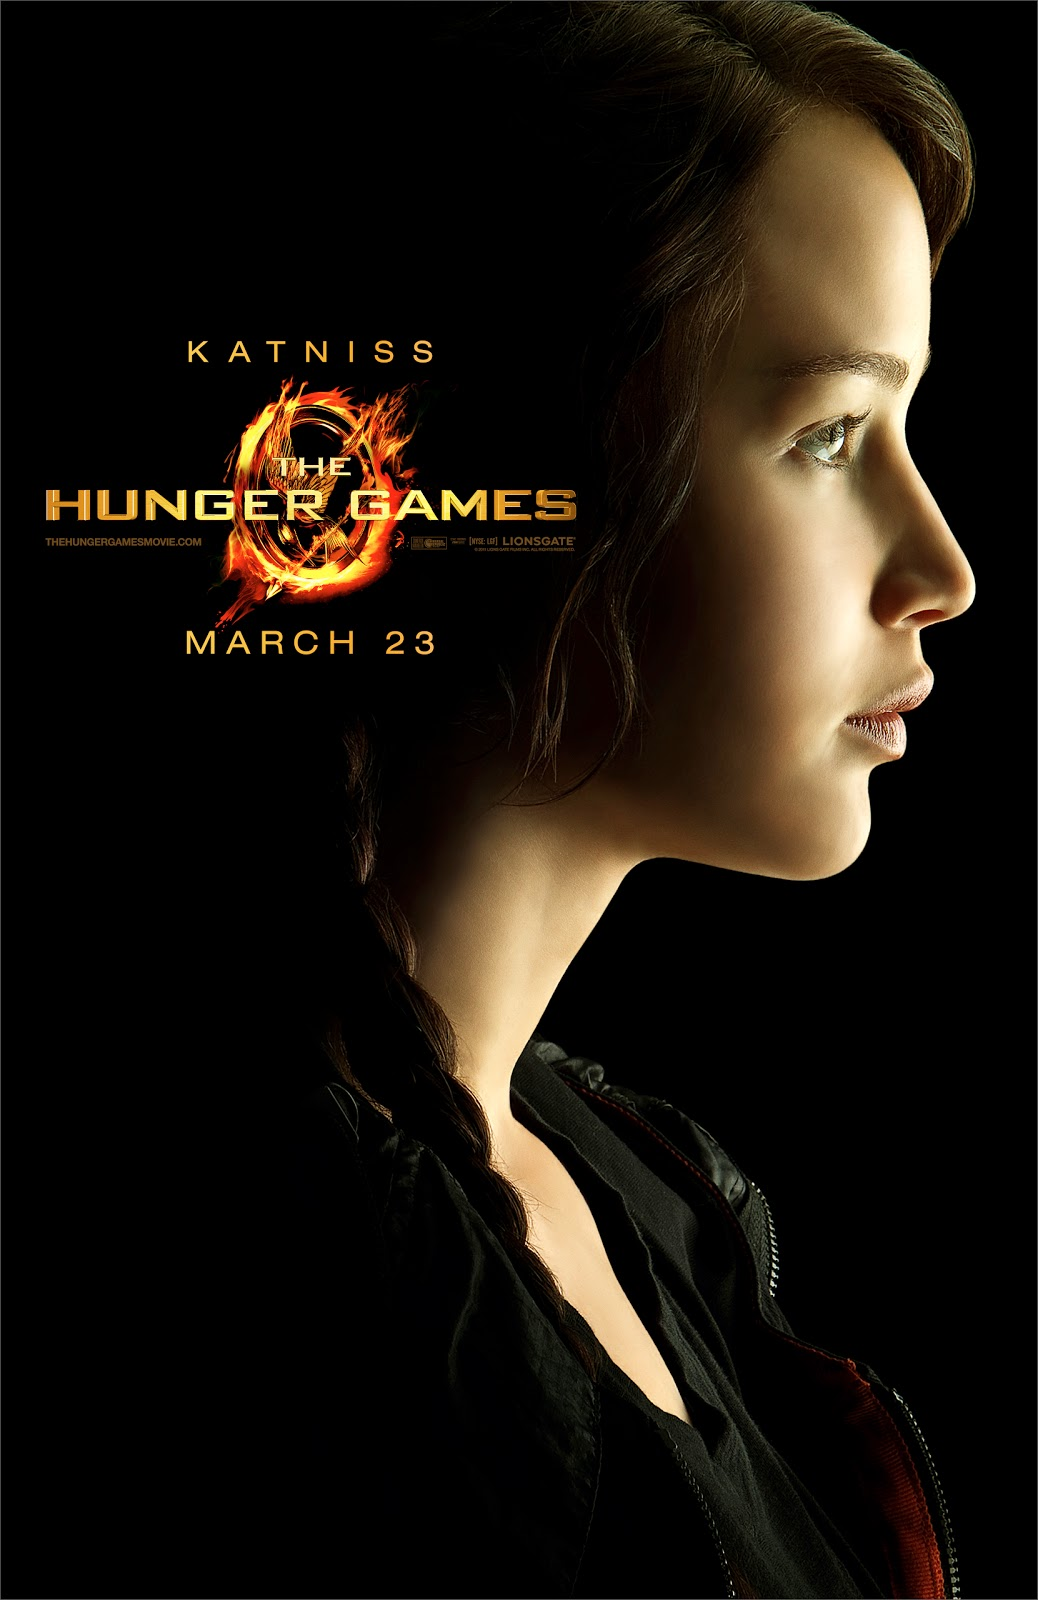 http://2.bp.blogspot.com/-qDUClZwUv0s/Tr7LkWLXDbI/AAAAAAAAAVM/mo2RCZ-soc4/s1600/Character-Poster-Hi-Res-Katniss.jpg